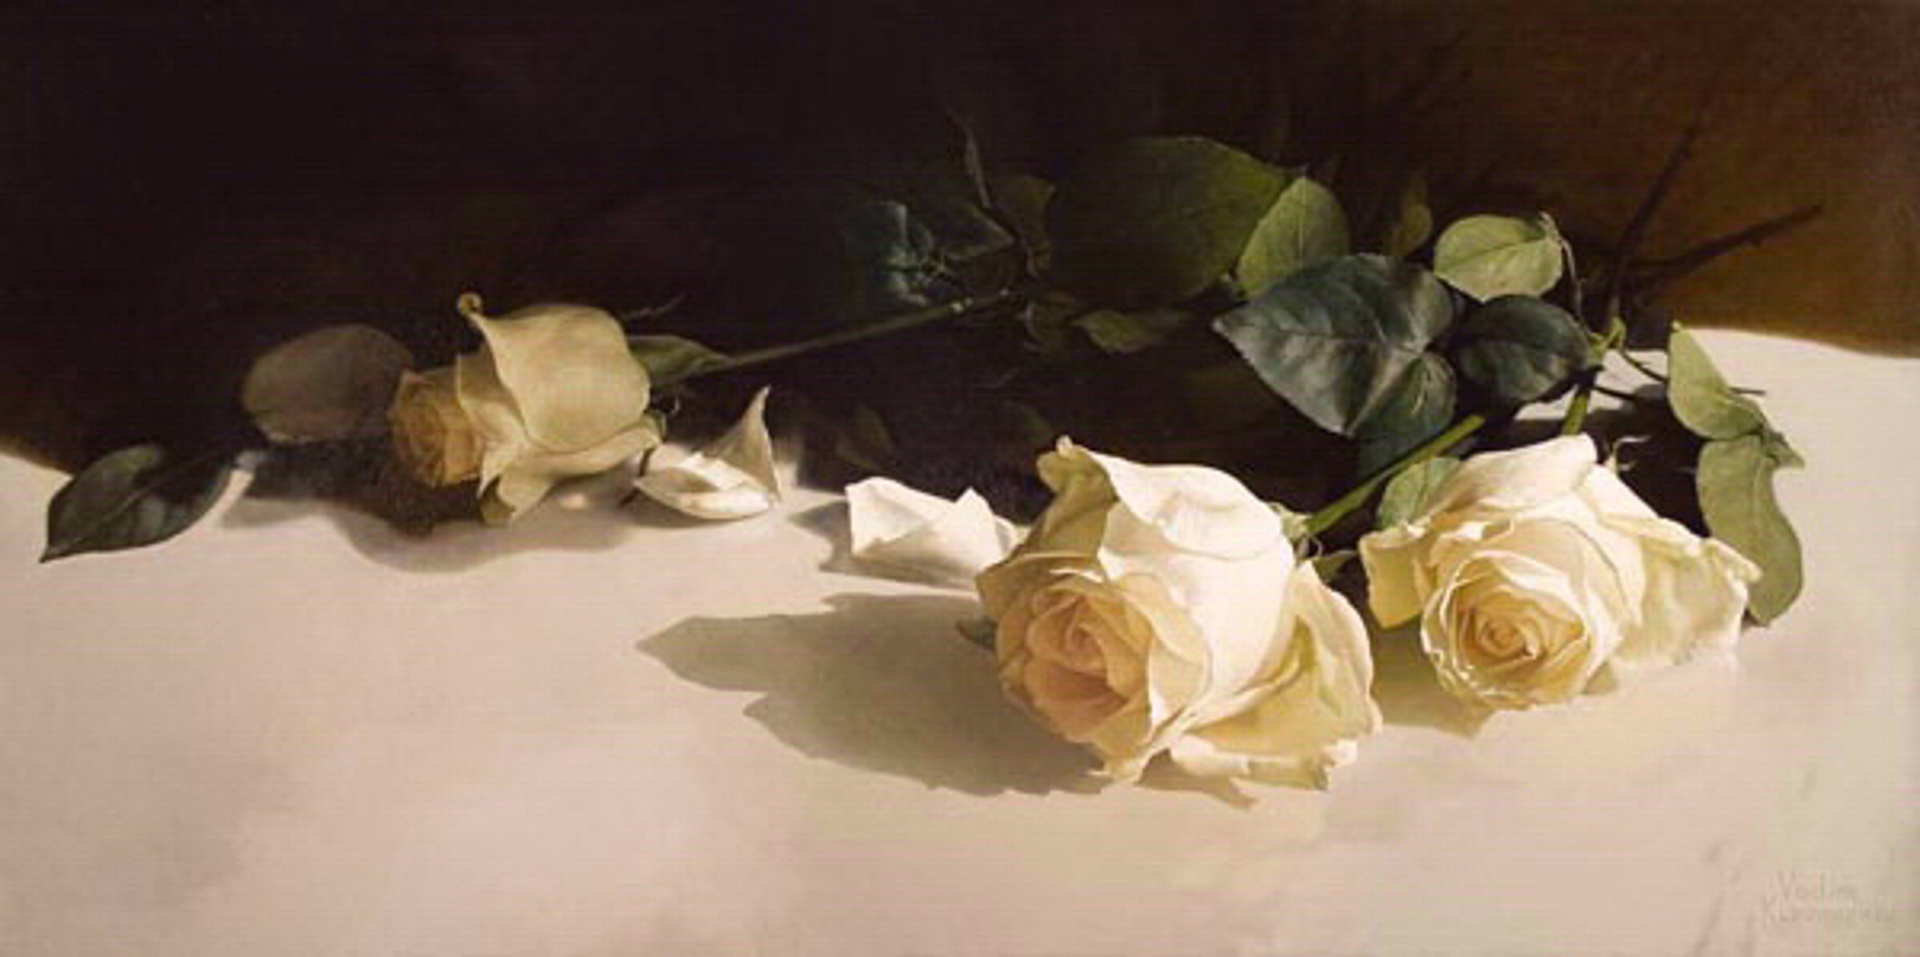 Long Stem Roses by Vadim Klevenskiy